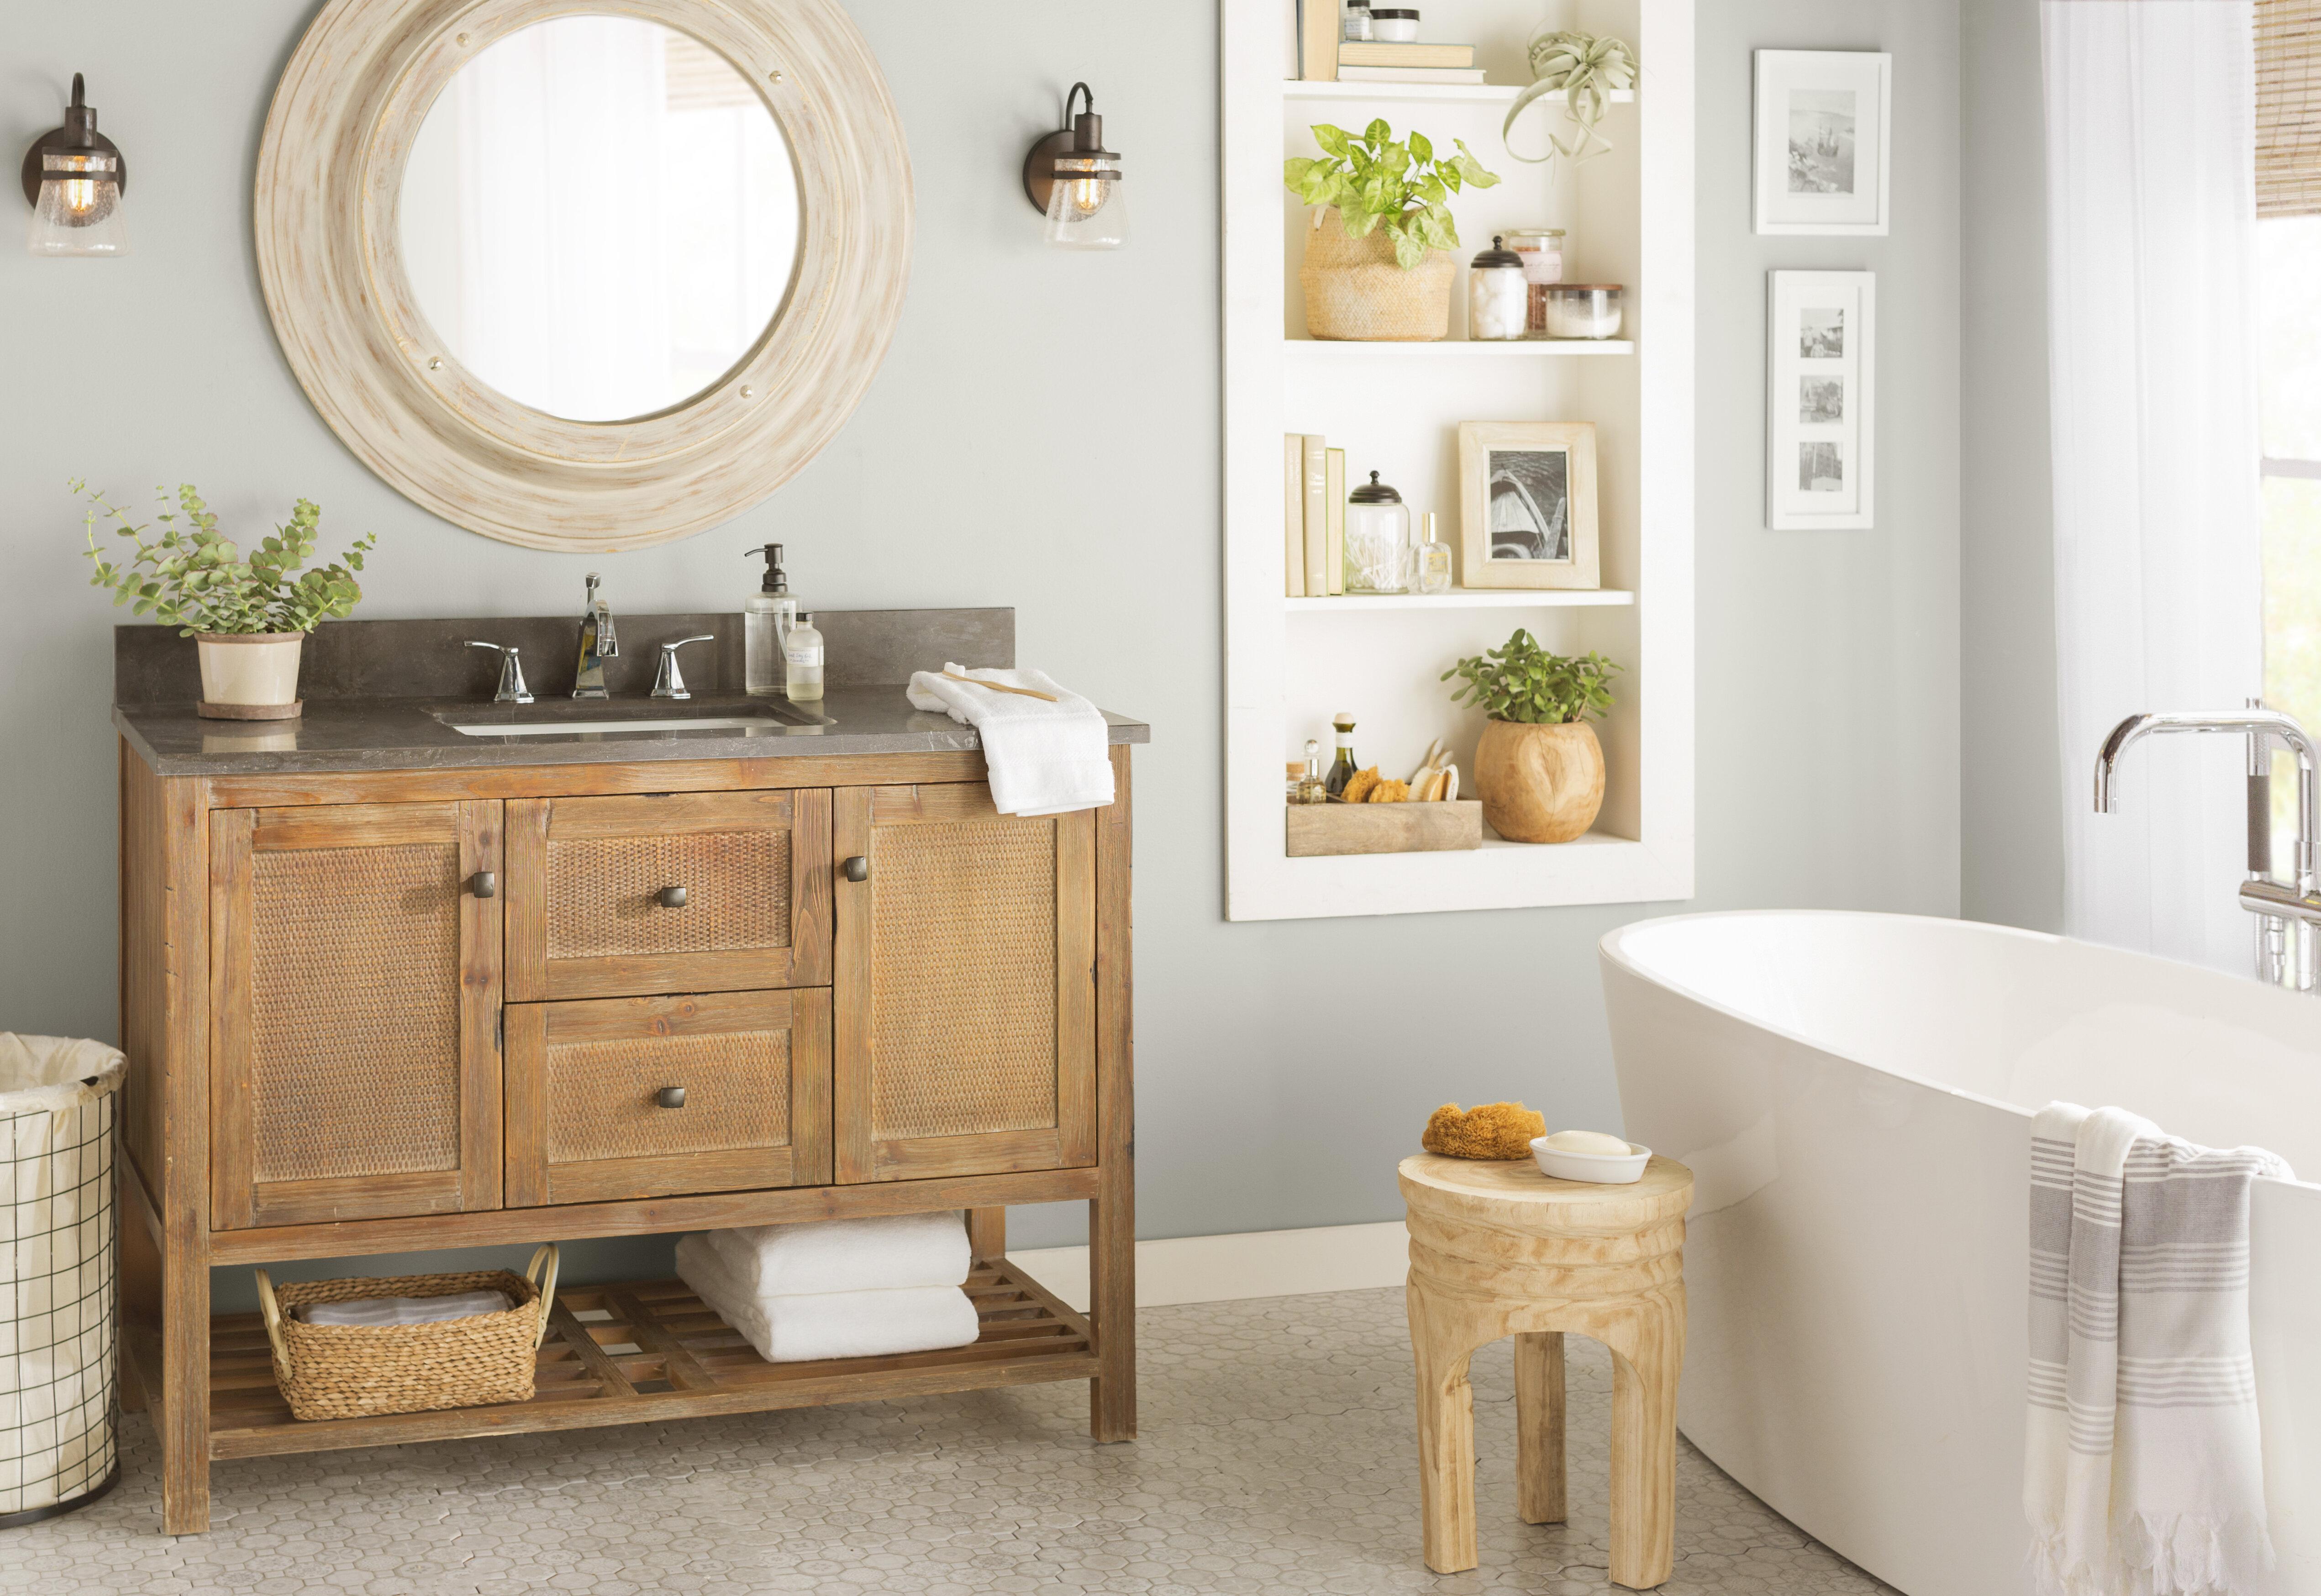 10 Beautiful Bathroom Remodel Ideas (With Photos!)  Wayfair